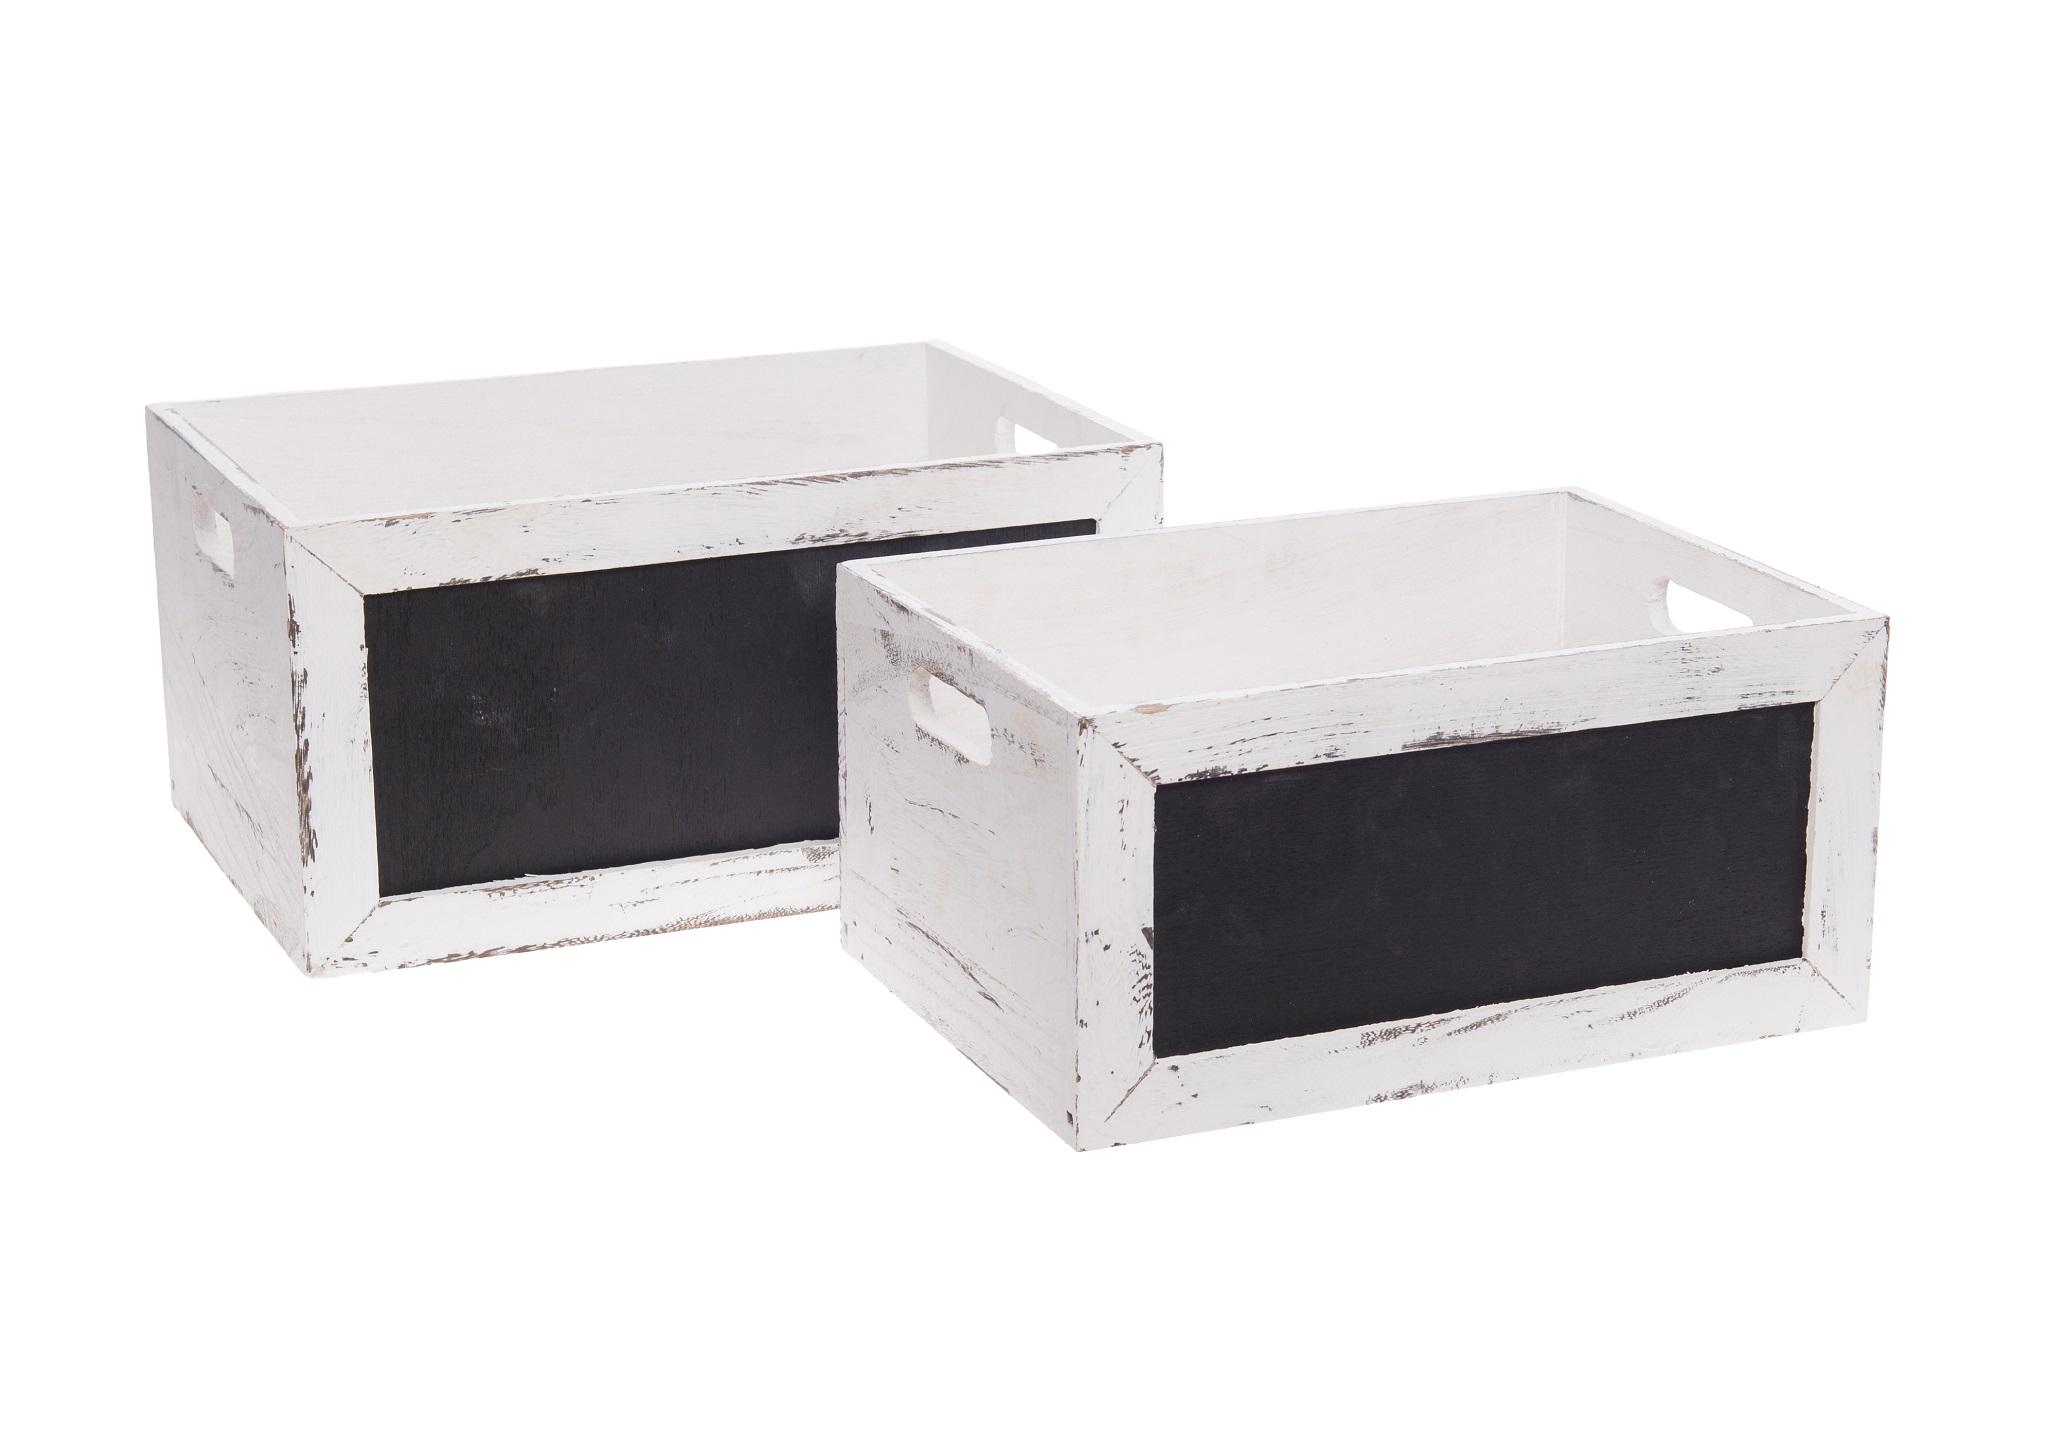 Набор коробок Peniche (2шт)Коробки<br>&amp;lt;div&amp;gt;&amp;lt;div&amp;gt;Набор из двух коробок&amp;lt;/div&amp;gt;&amp;lt;div&amp;gt;Размеры &amp;amp;nbsp;1) 3 Х26Х18; 2) 33Х23Х16&amp;lt;/div&amp;gt;&amp;lt;/div&amp;gt;&amp;lt;div&amp;gt;Цвет:&amp;amp;nbsp;белый, черный&amp;lt;/div&amp;gt;<br><br>Material: Дерево<br>Ширина см: 36.0<br>Высота см: 18.0<br>Глубина см: 26.0